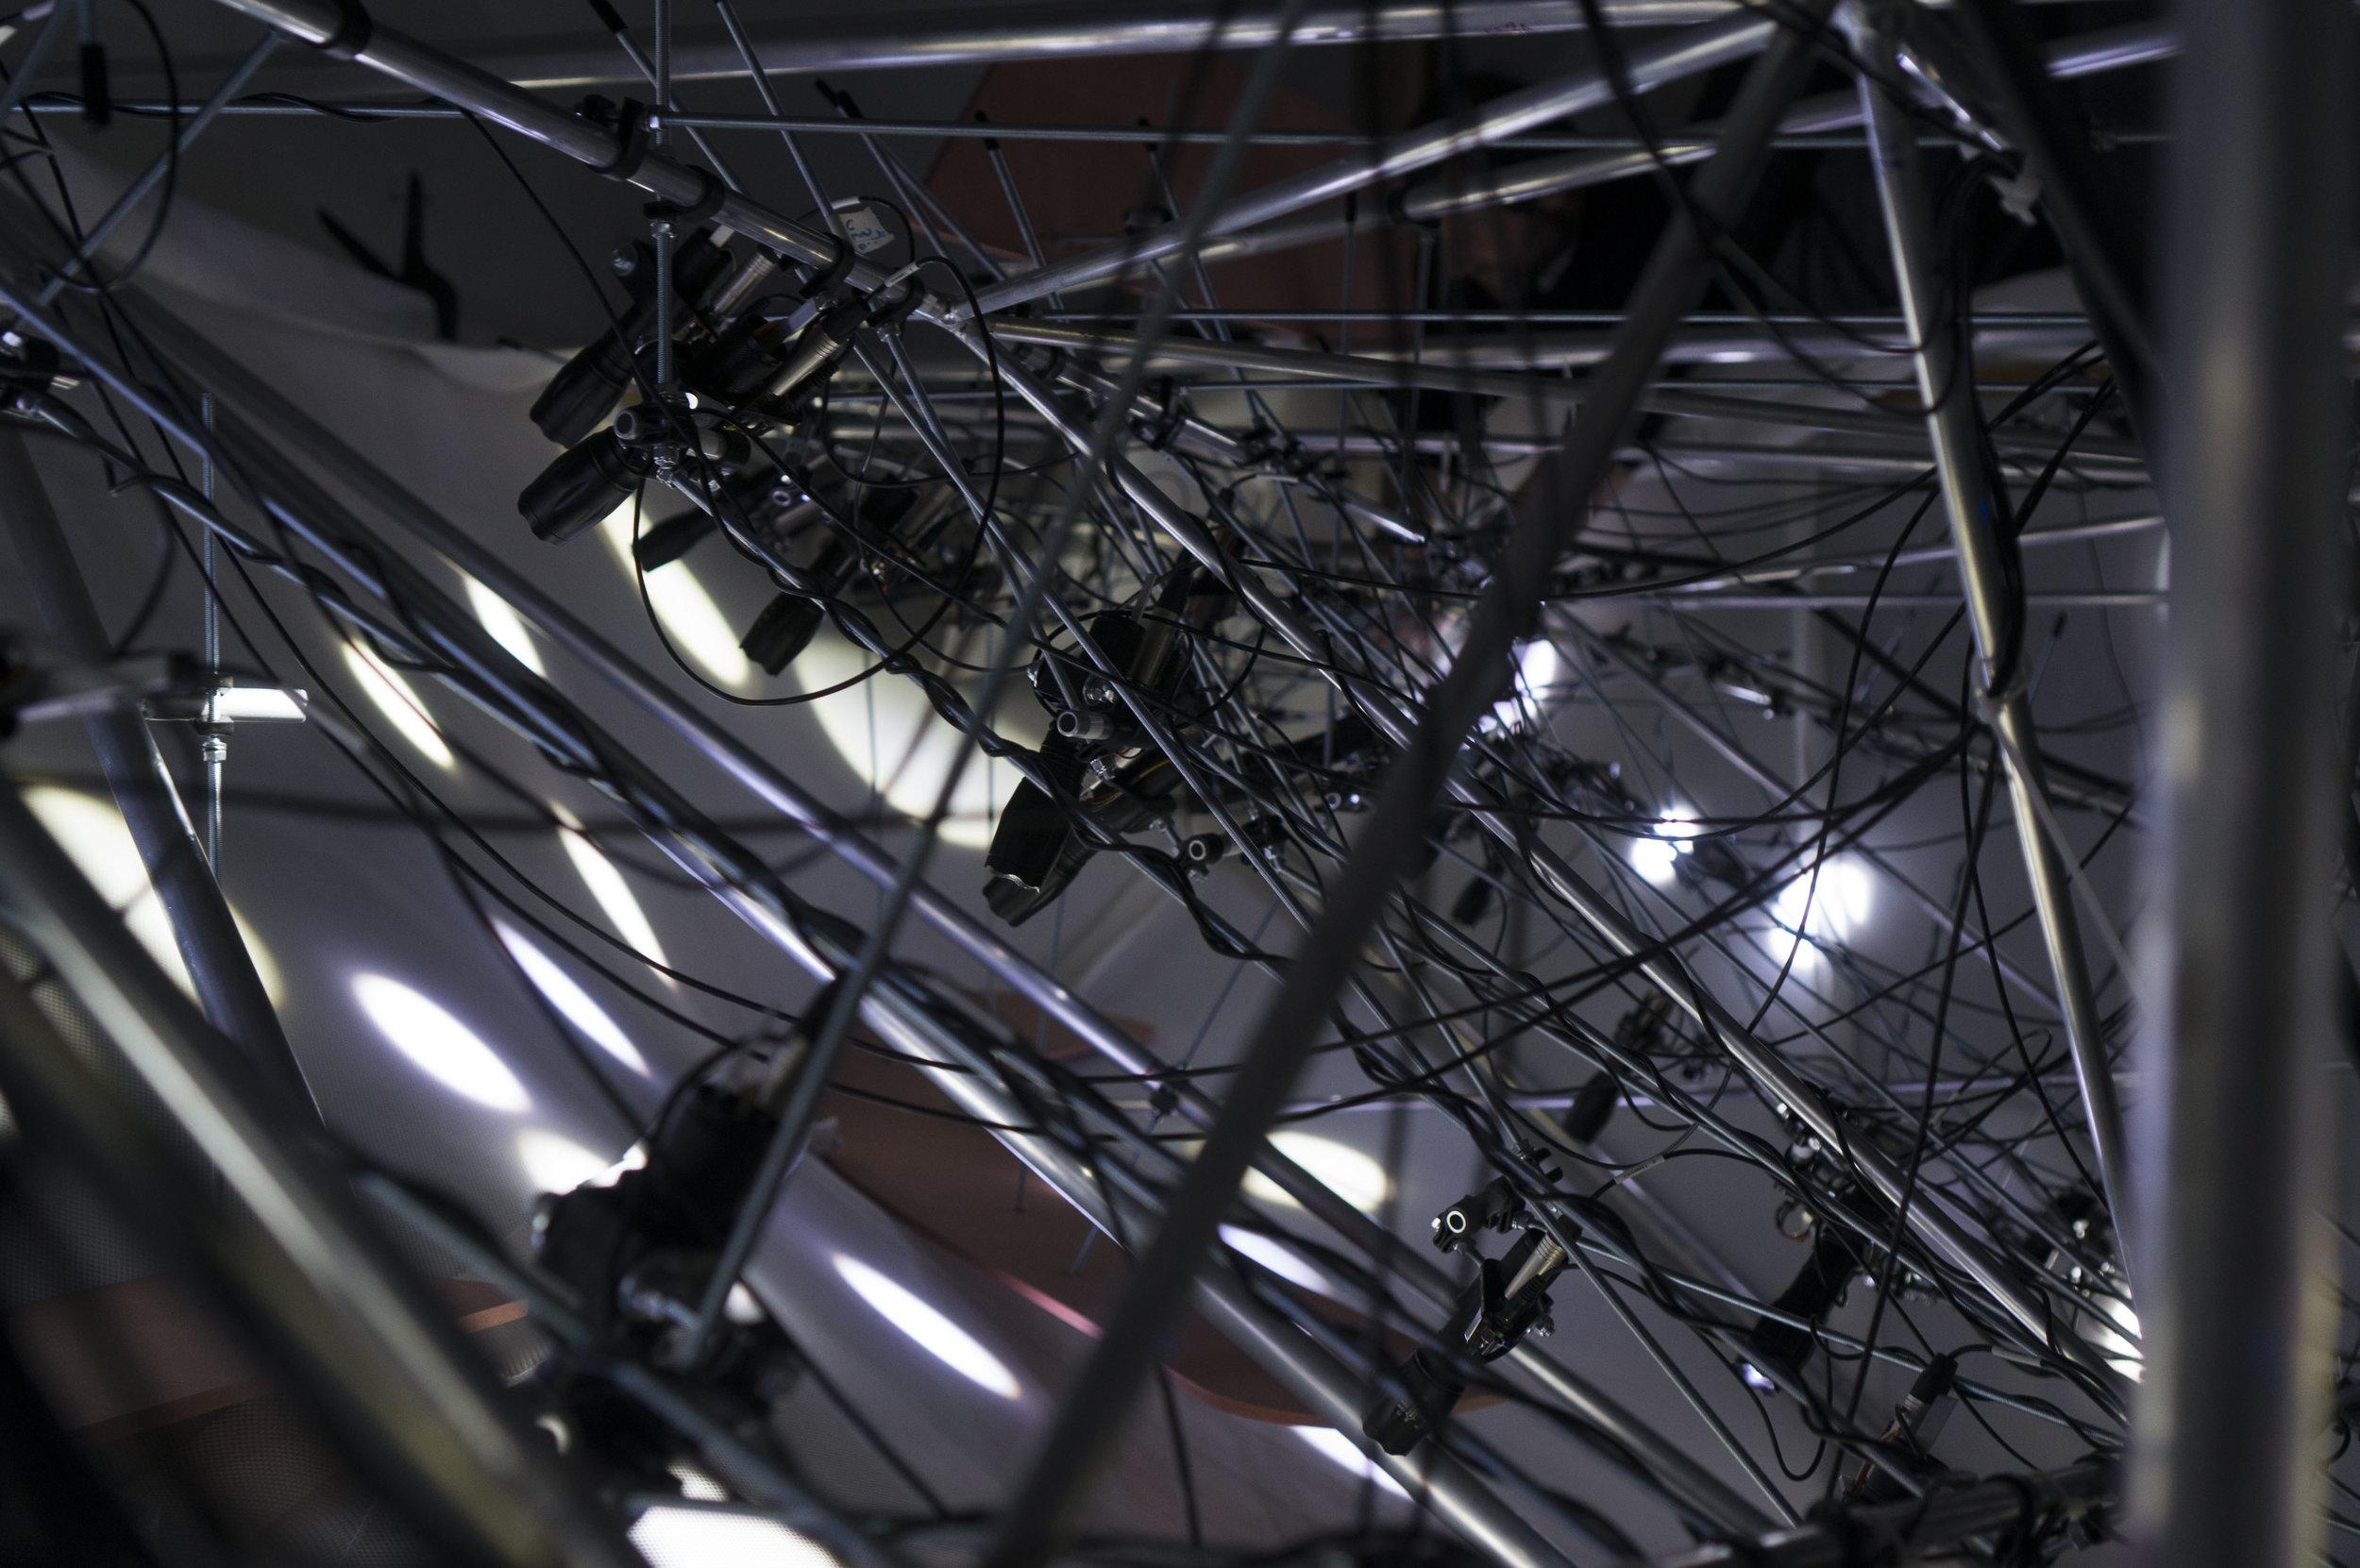 Copy of Copy of Cabling.JPG